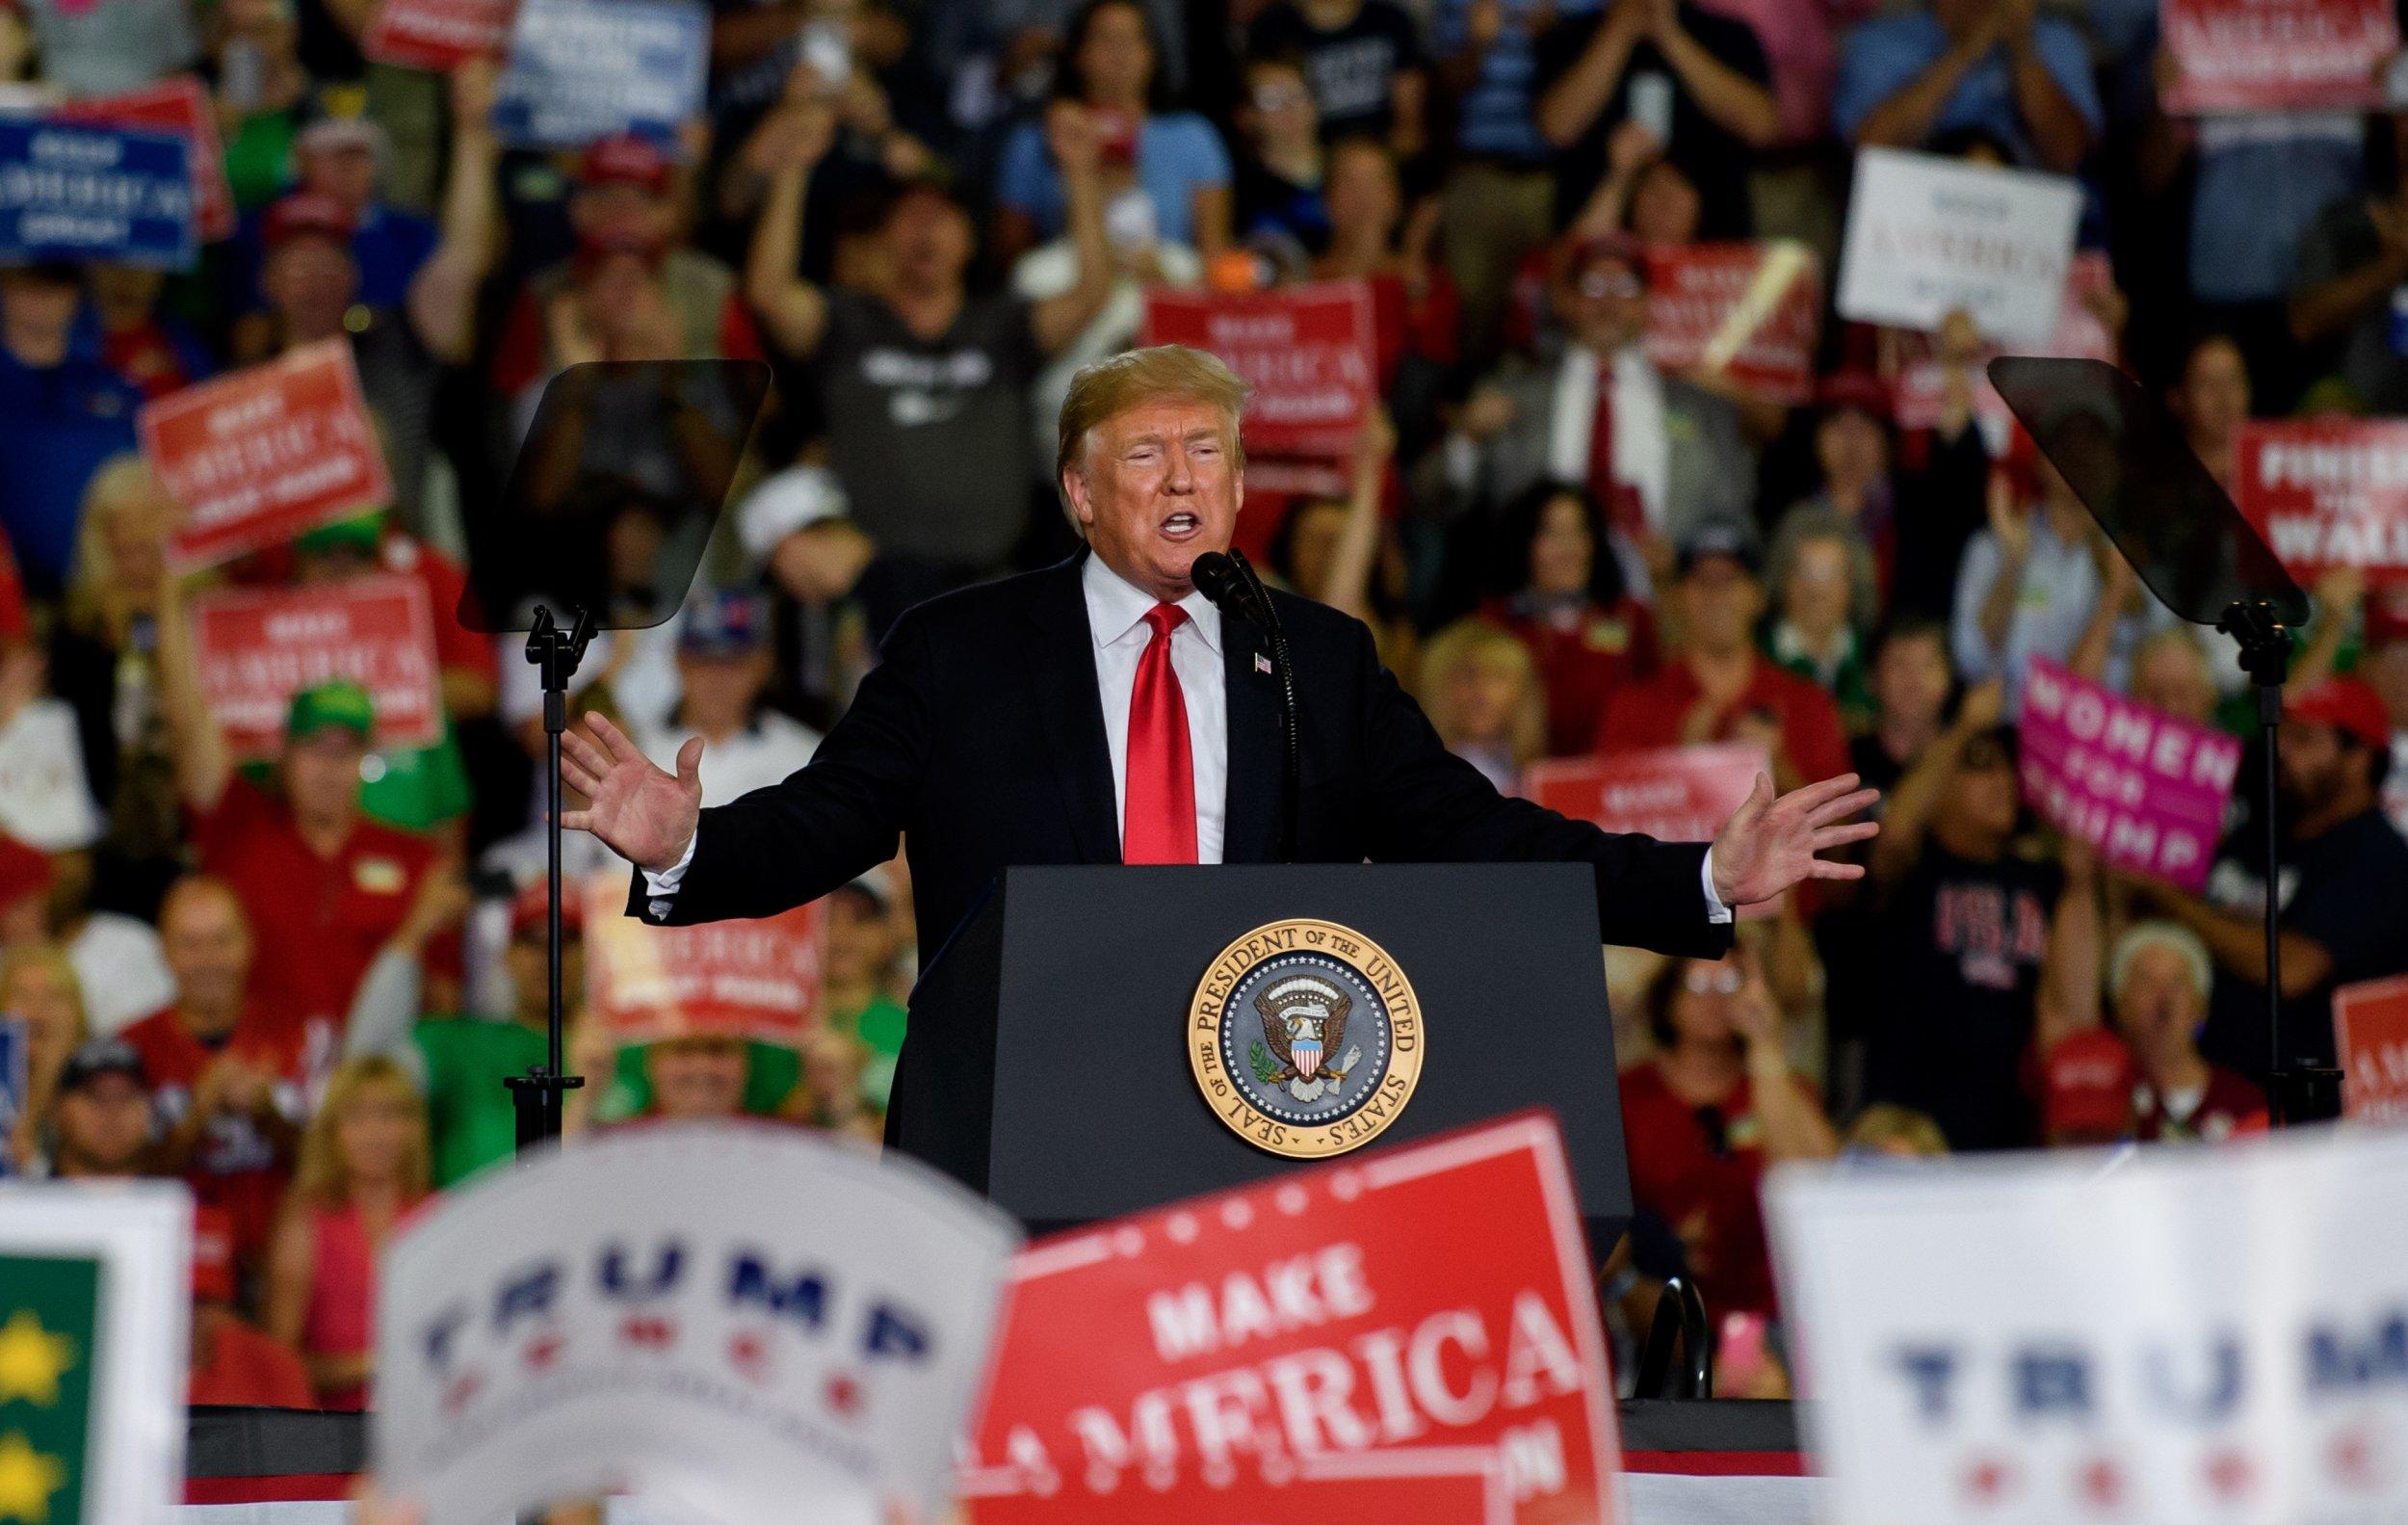 Donald Trump Pennsylvania rally